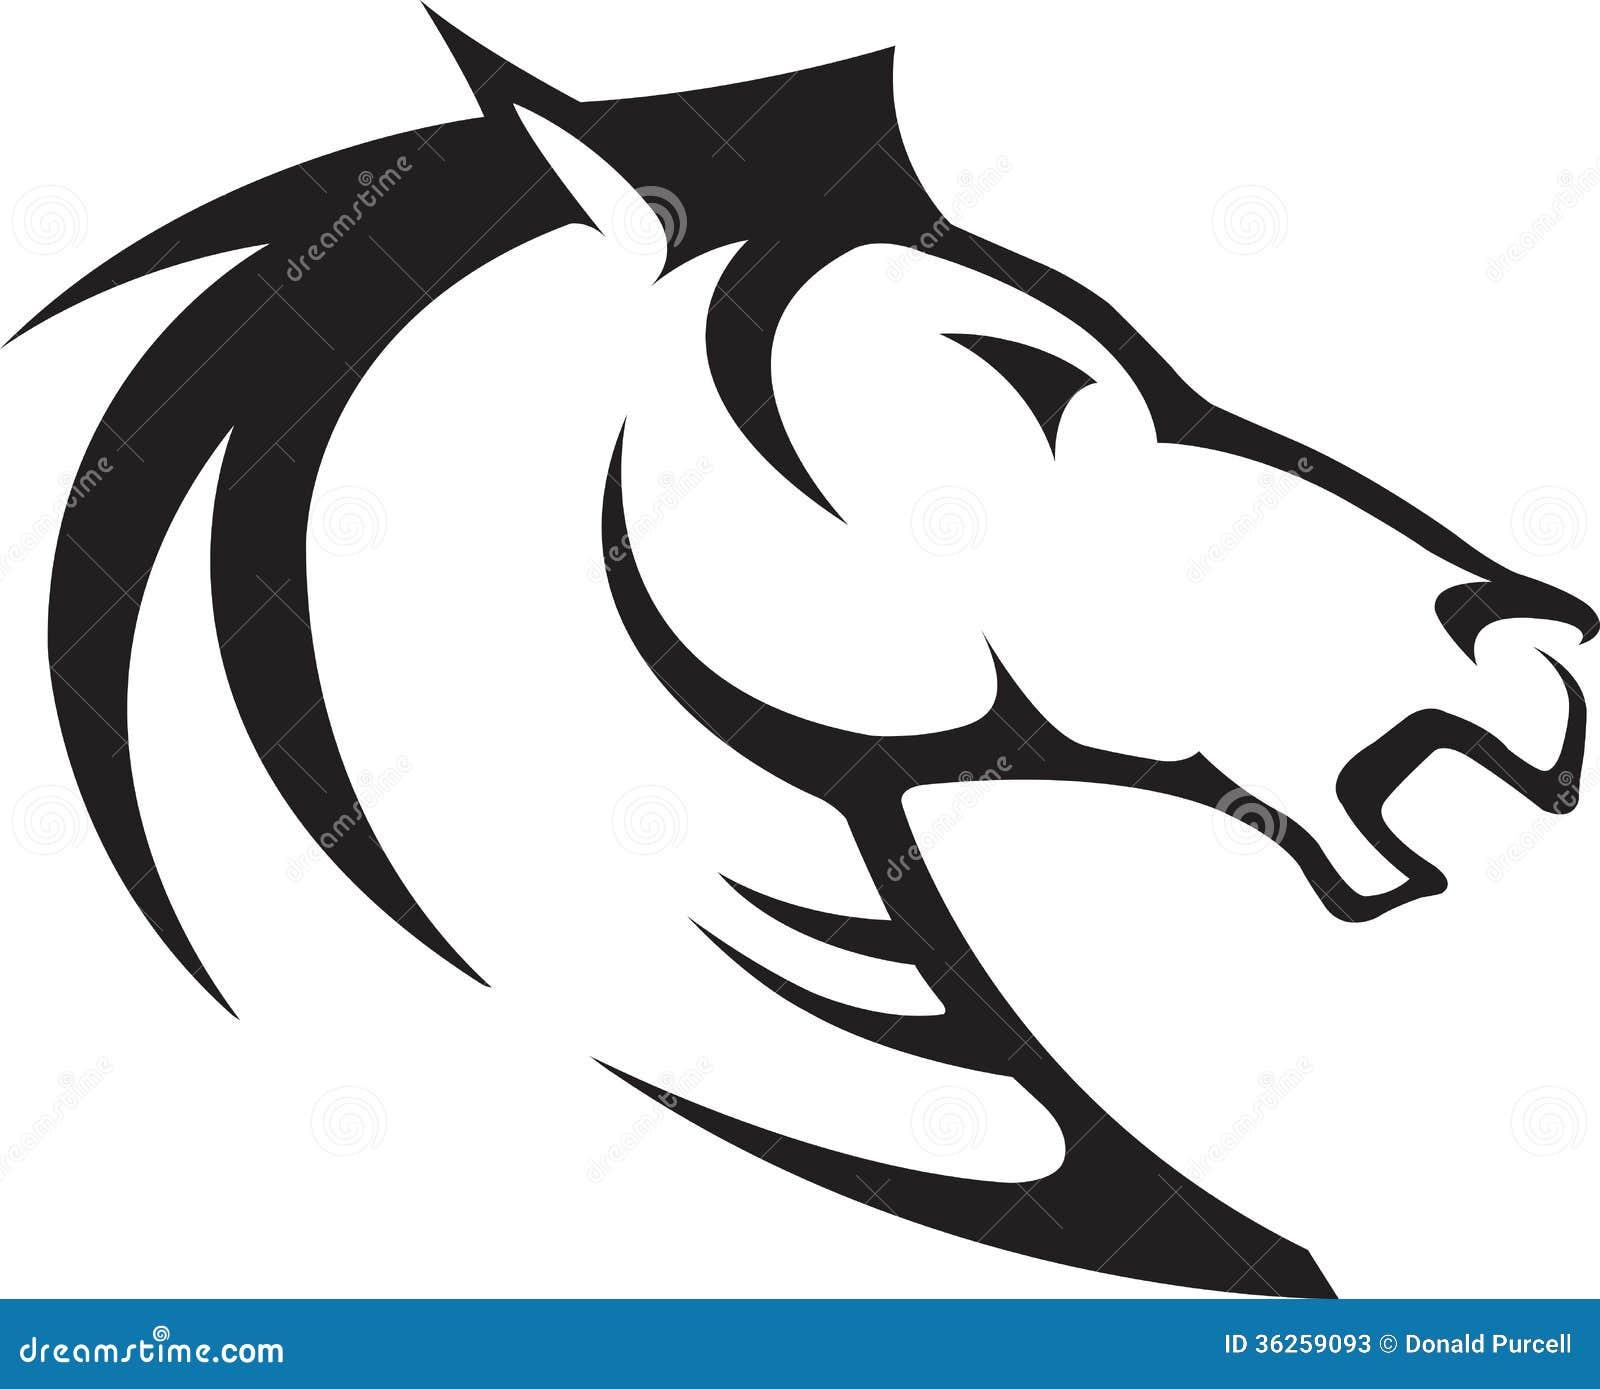 horse bust profile stock photos